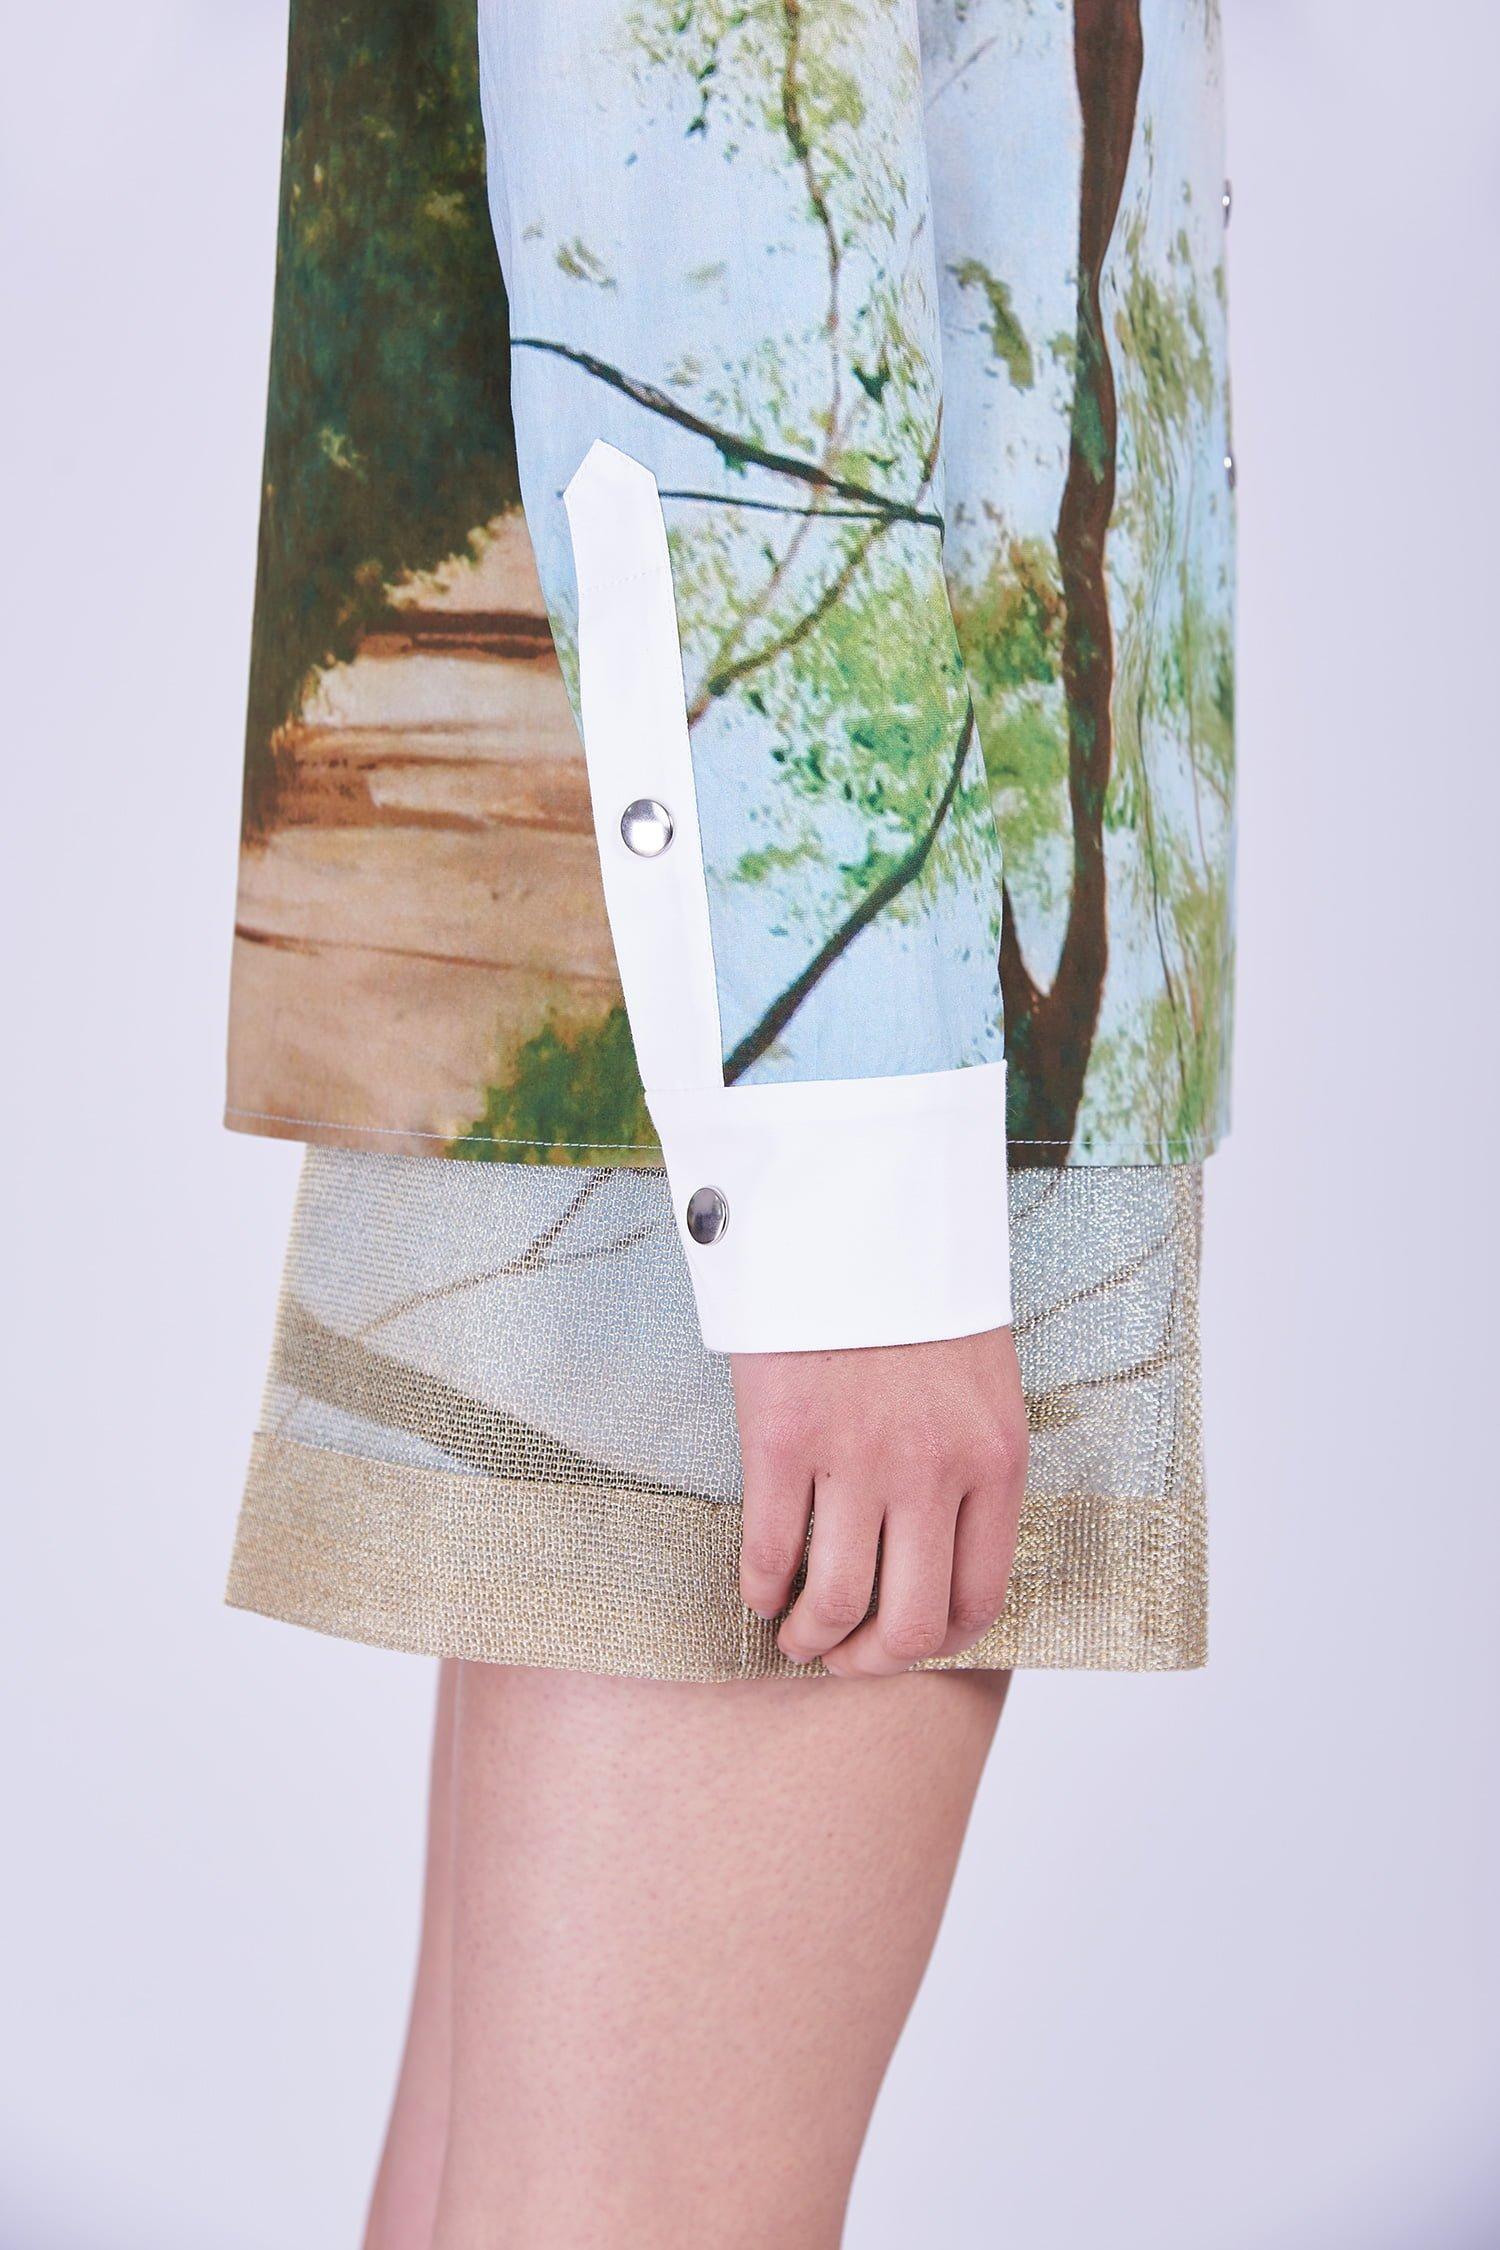 Acephala Ss2020 Printed Shirt Forest Golden Shorts Koszula Nadruk Las Zlote Szorty Front Detail Cuff 2